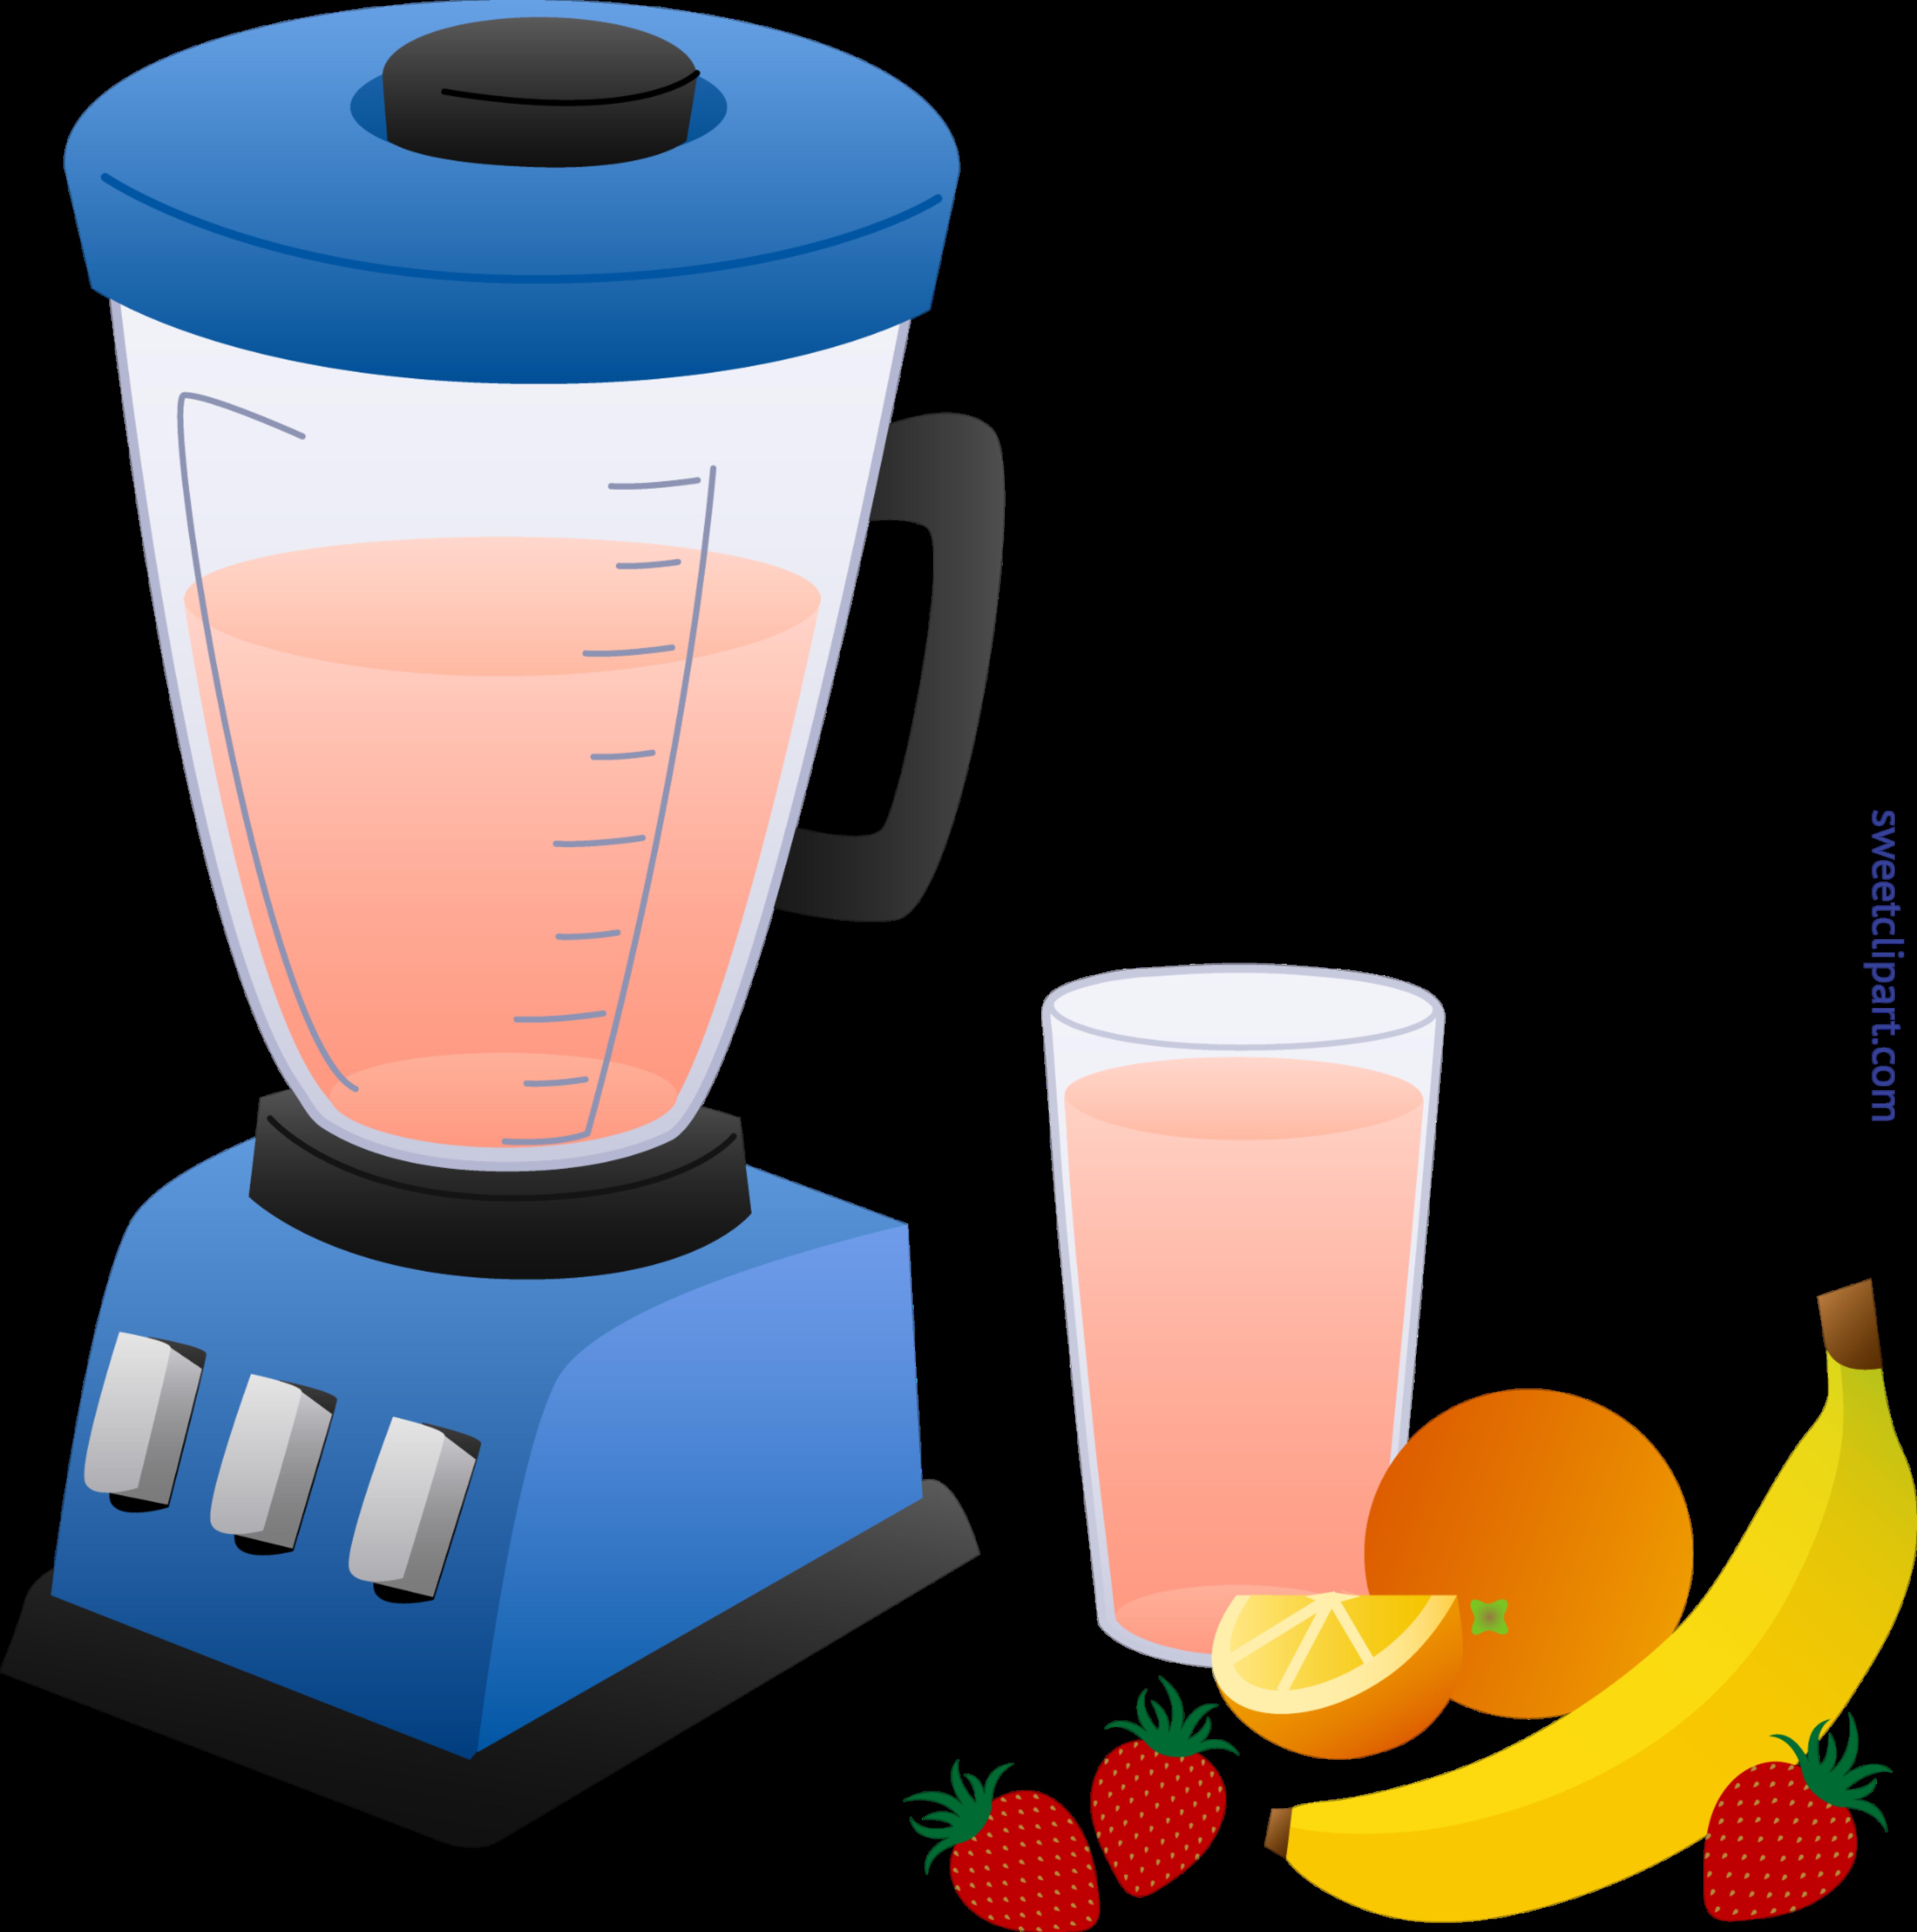 clipart transparent download And fruit smoothie clip. Blender clipart